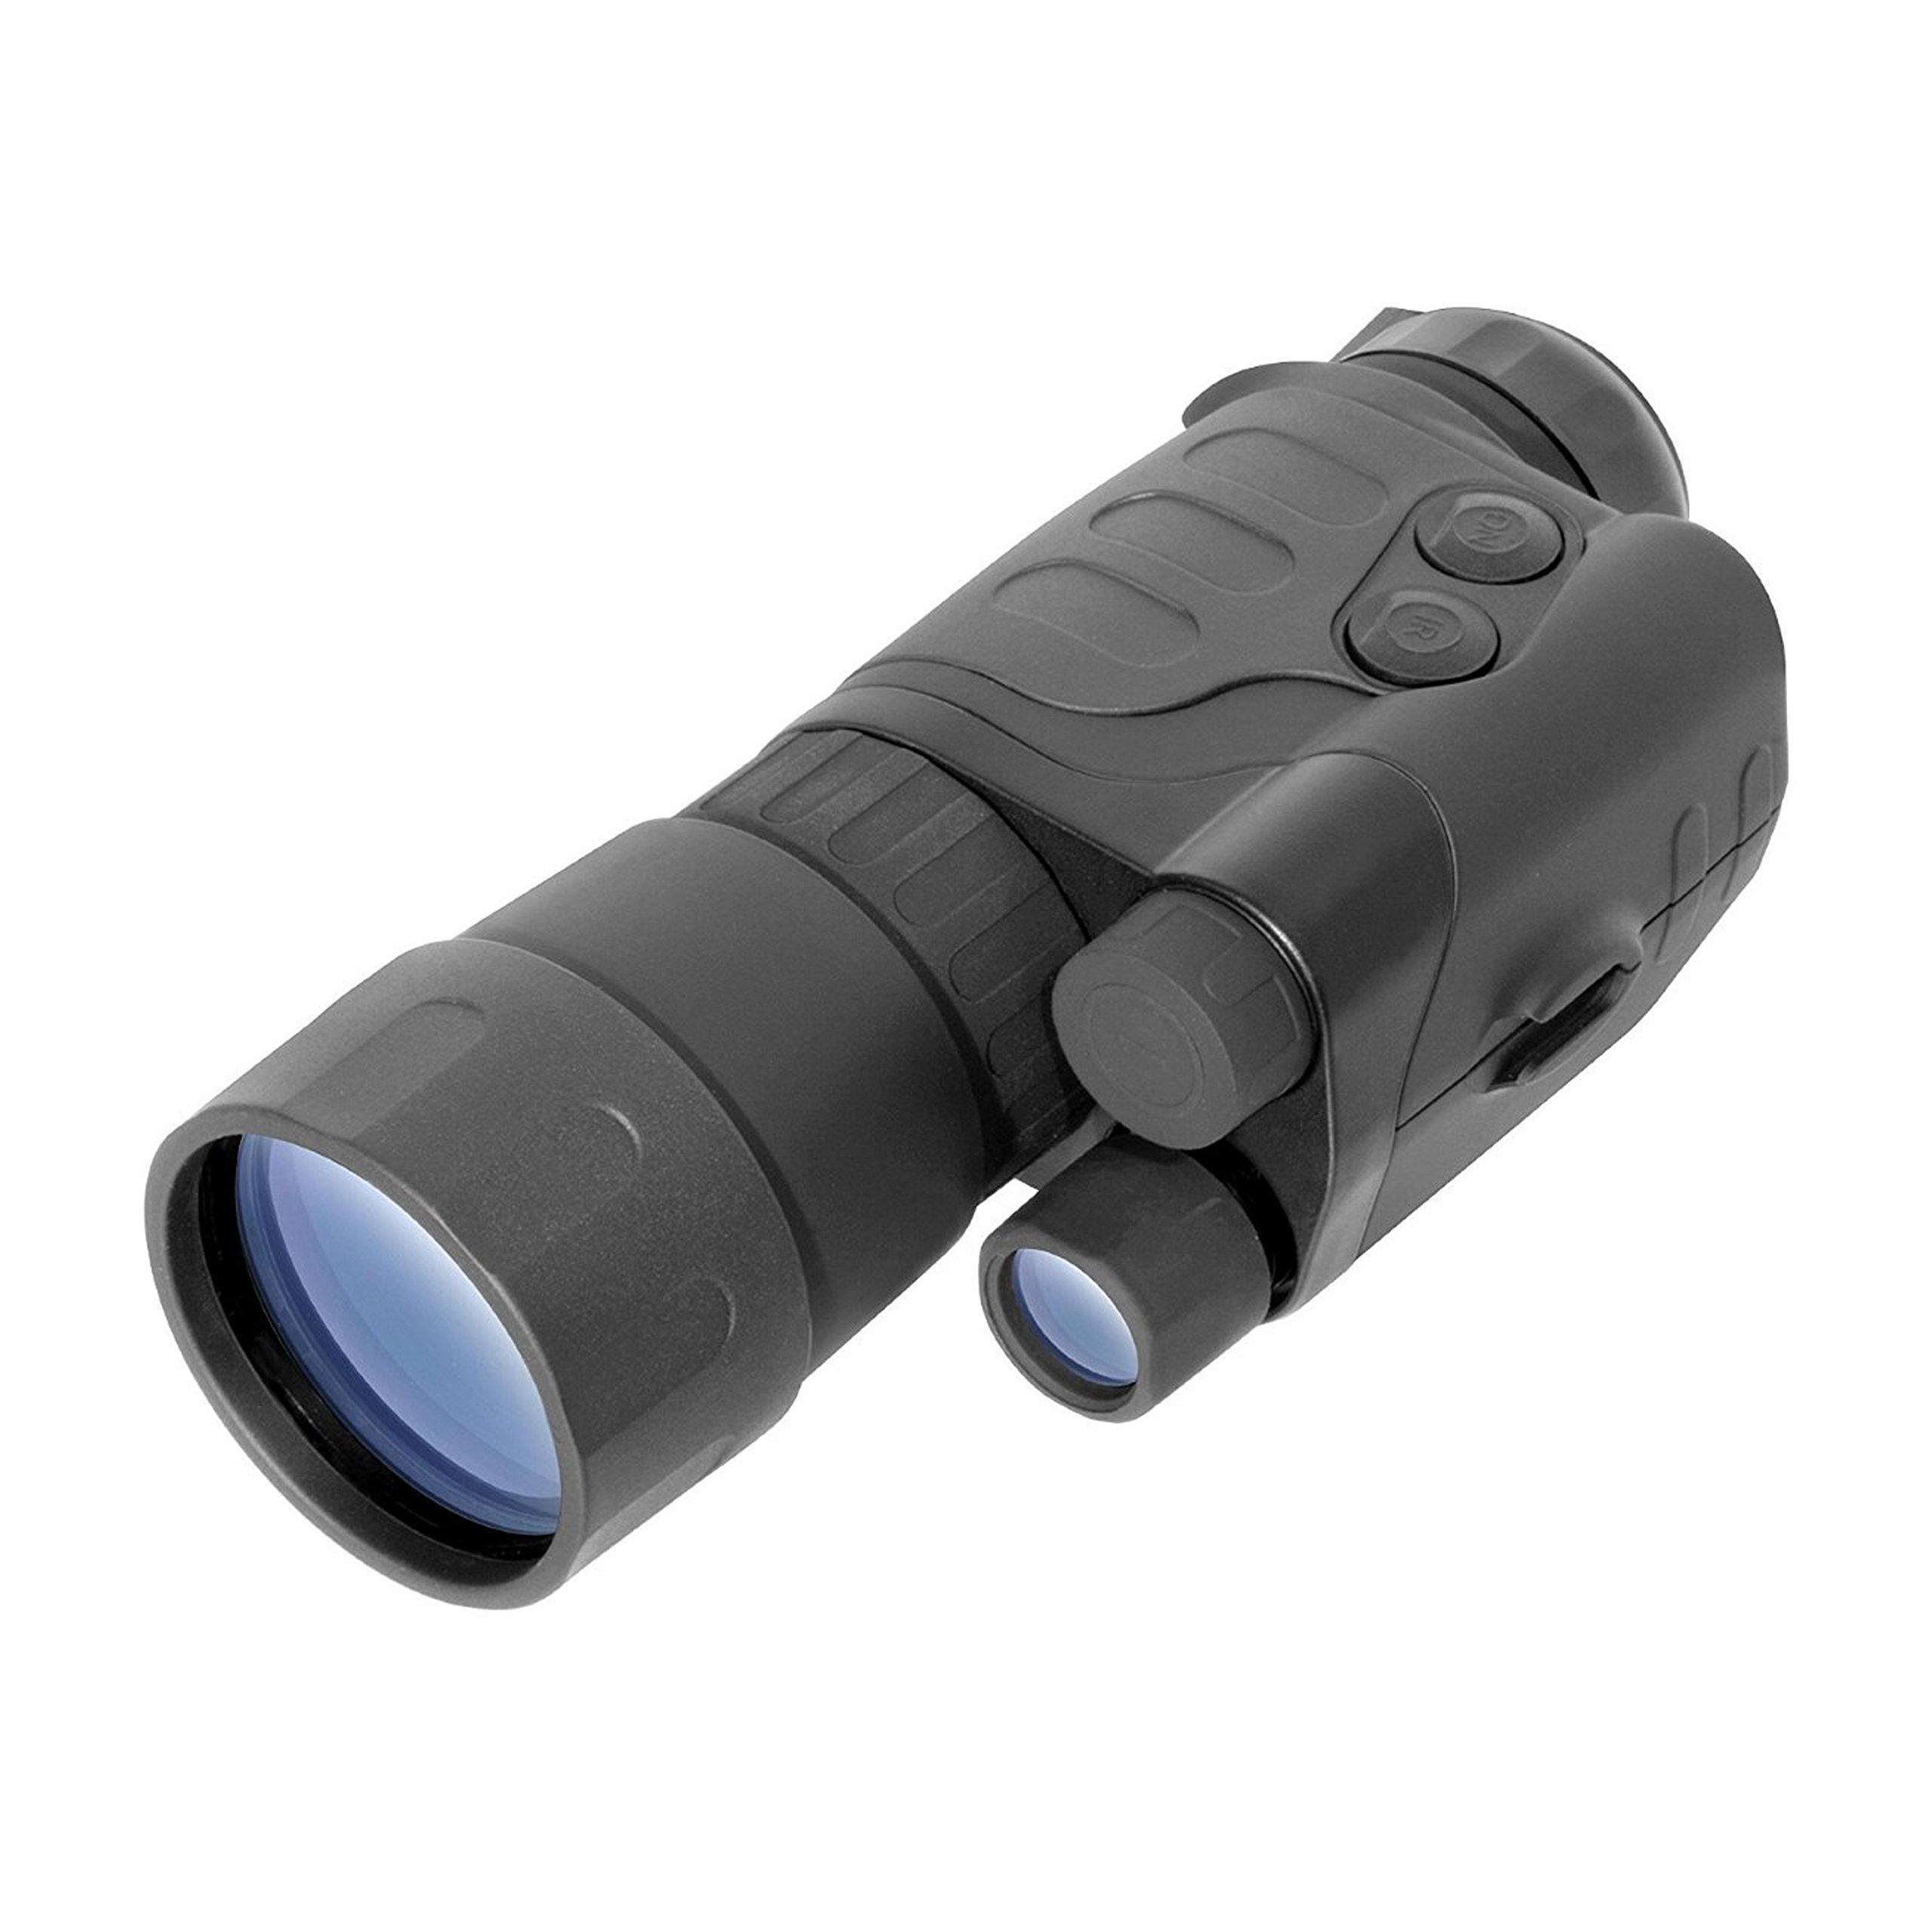 Yukon Exelon 3x50 Night Vision Scope by Yukon Advanced Optics